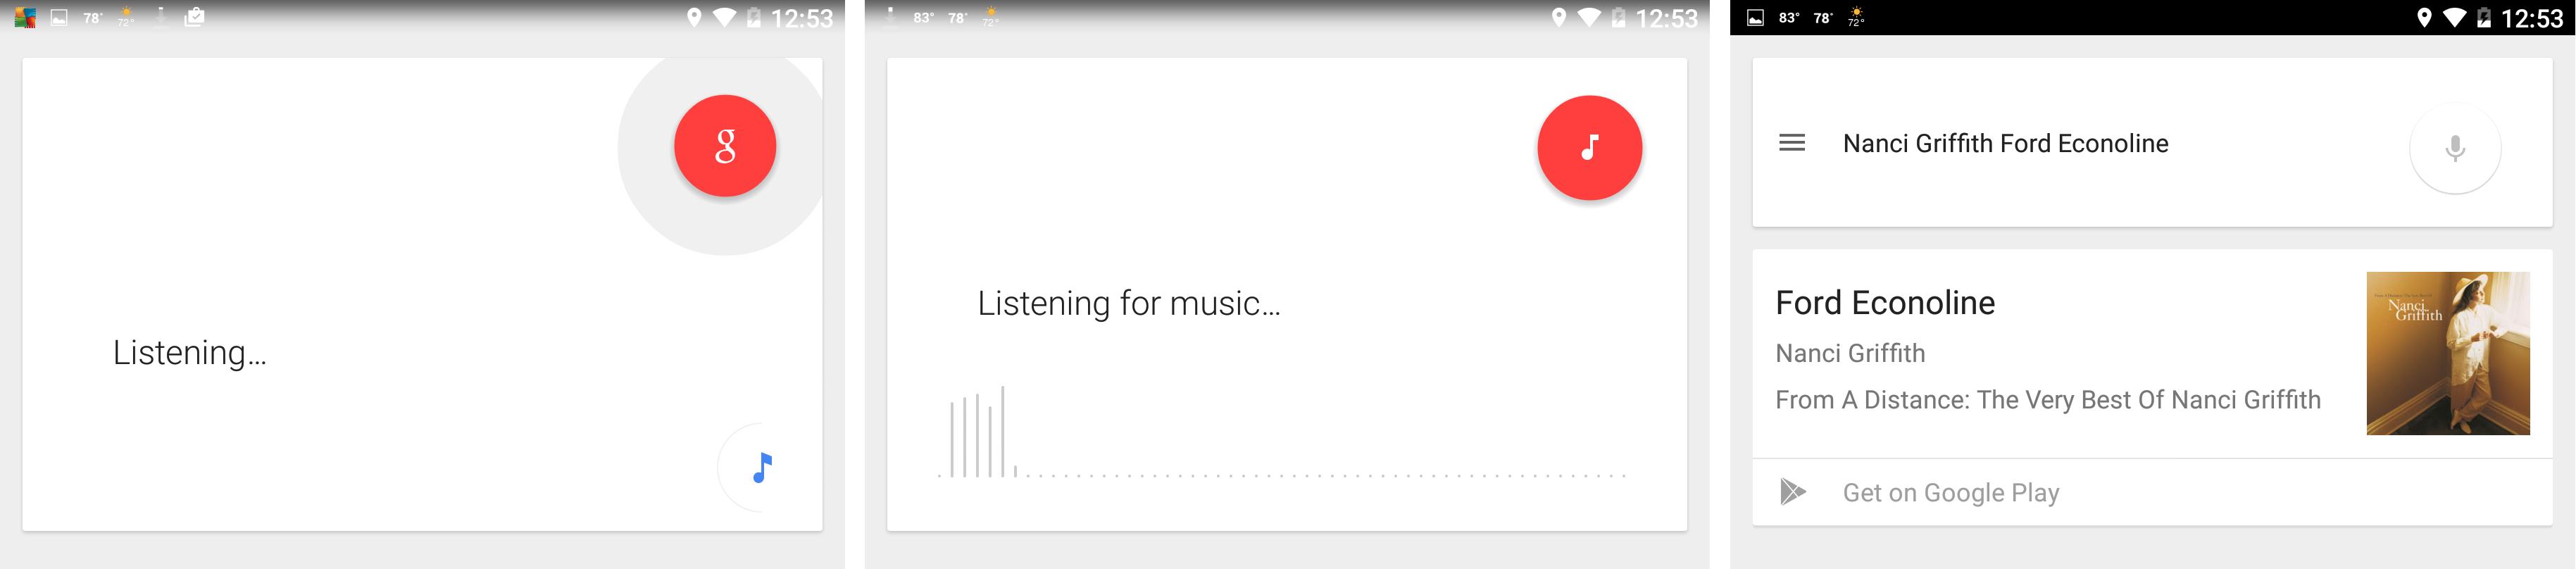 googlenow_music